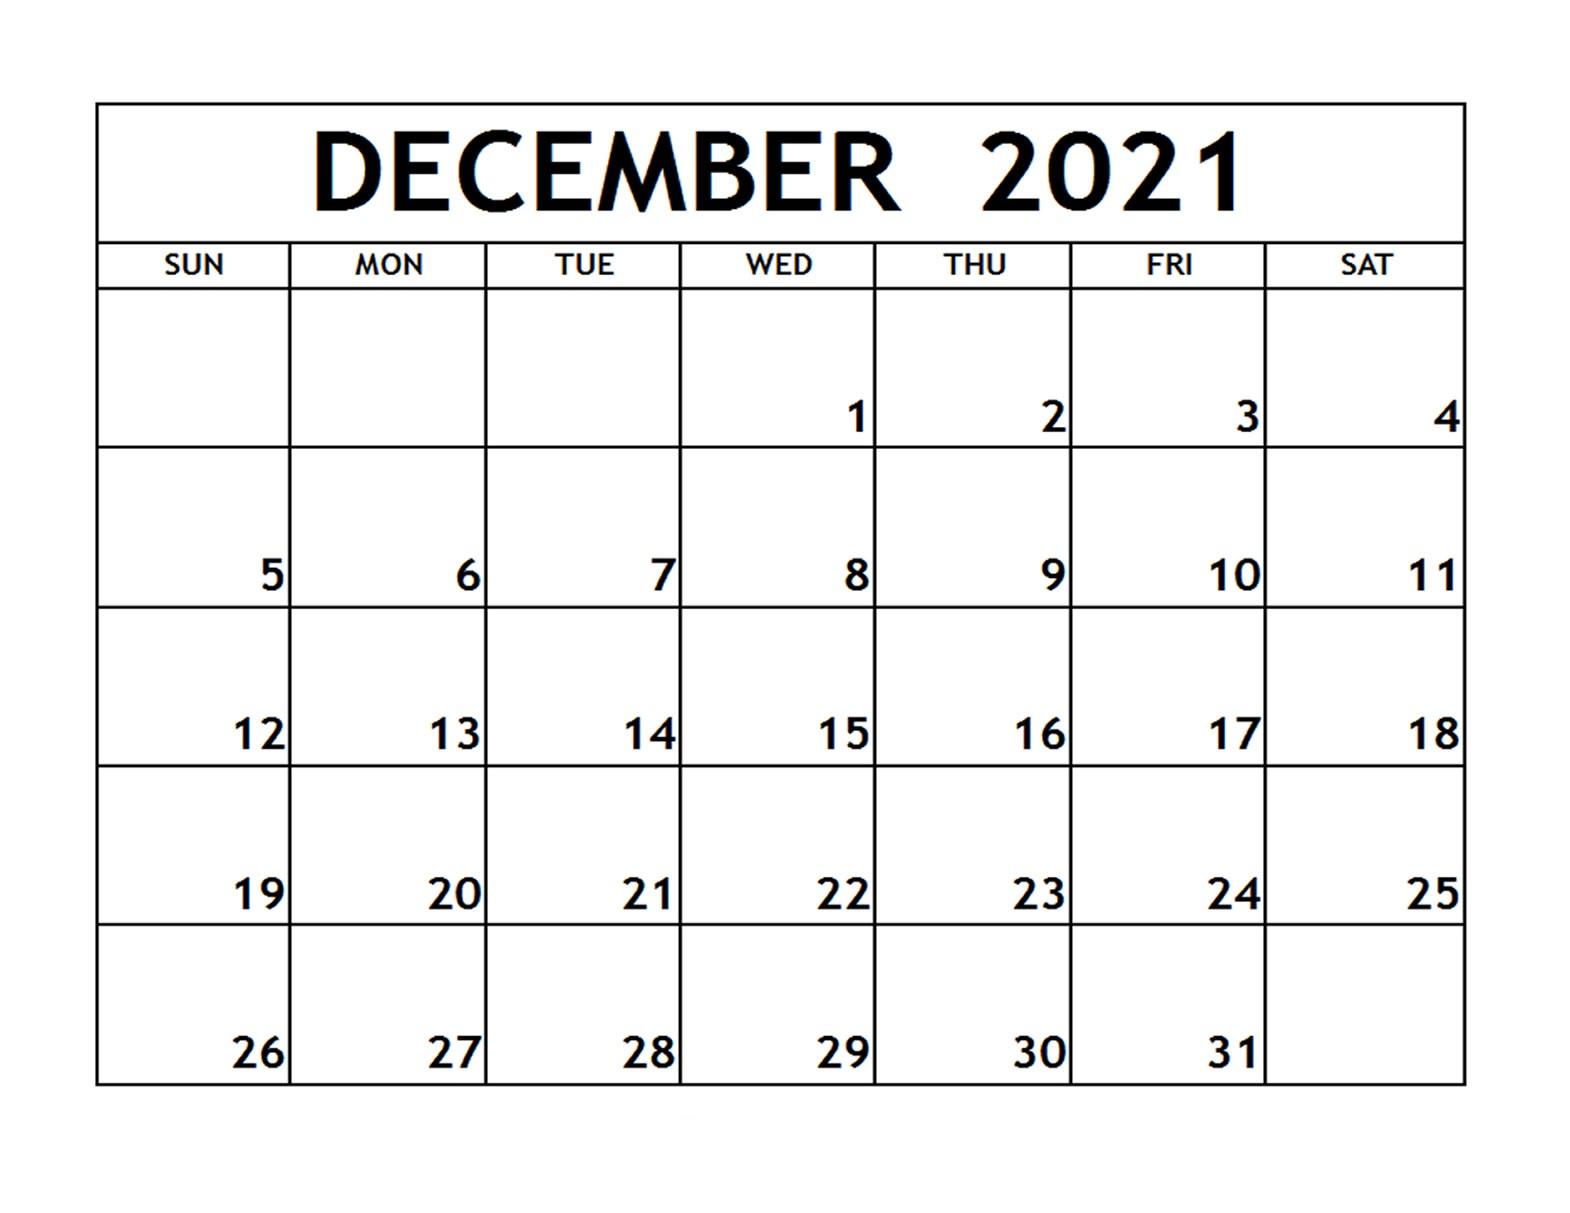 December 2021 Calendar With Bank Holidays